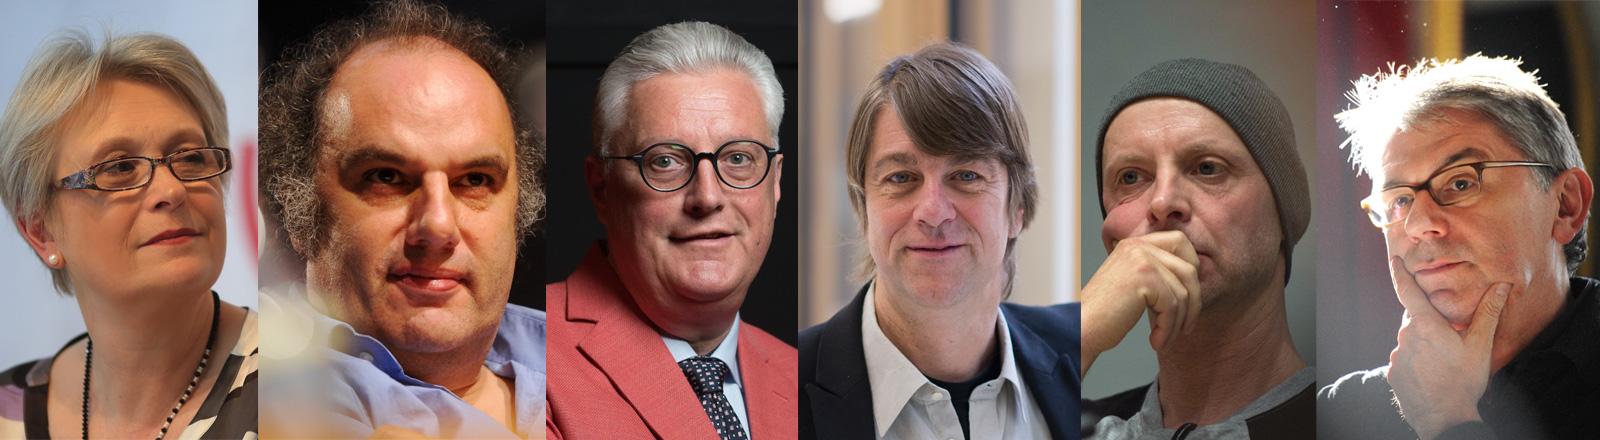 Theaterintendanten wehren sich gegen rechtsnationale Angriffe: Karen Stone, Matthias Lilienthal, Guy Montavon, Holger Schultze, Armin Petras, Ulrich Khuon.